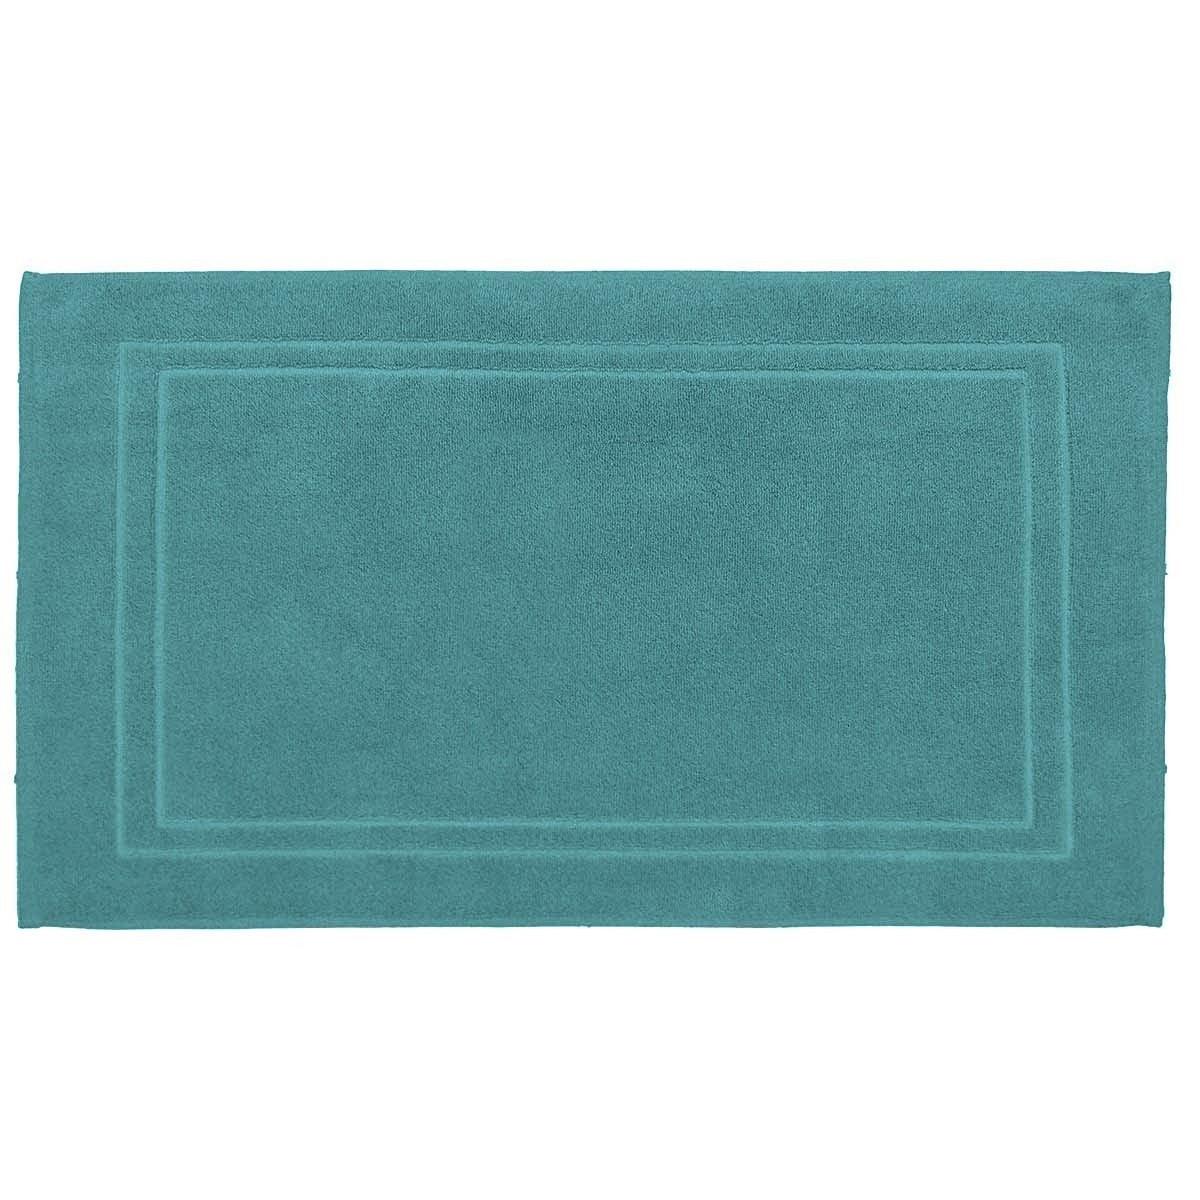 Tapis de bain 900gr/m² Canard 50x80 cm